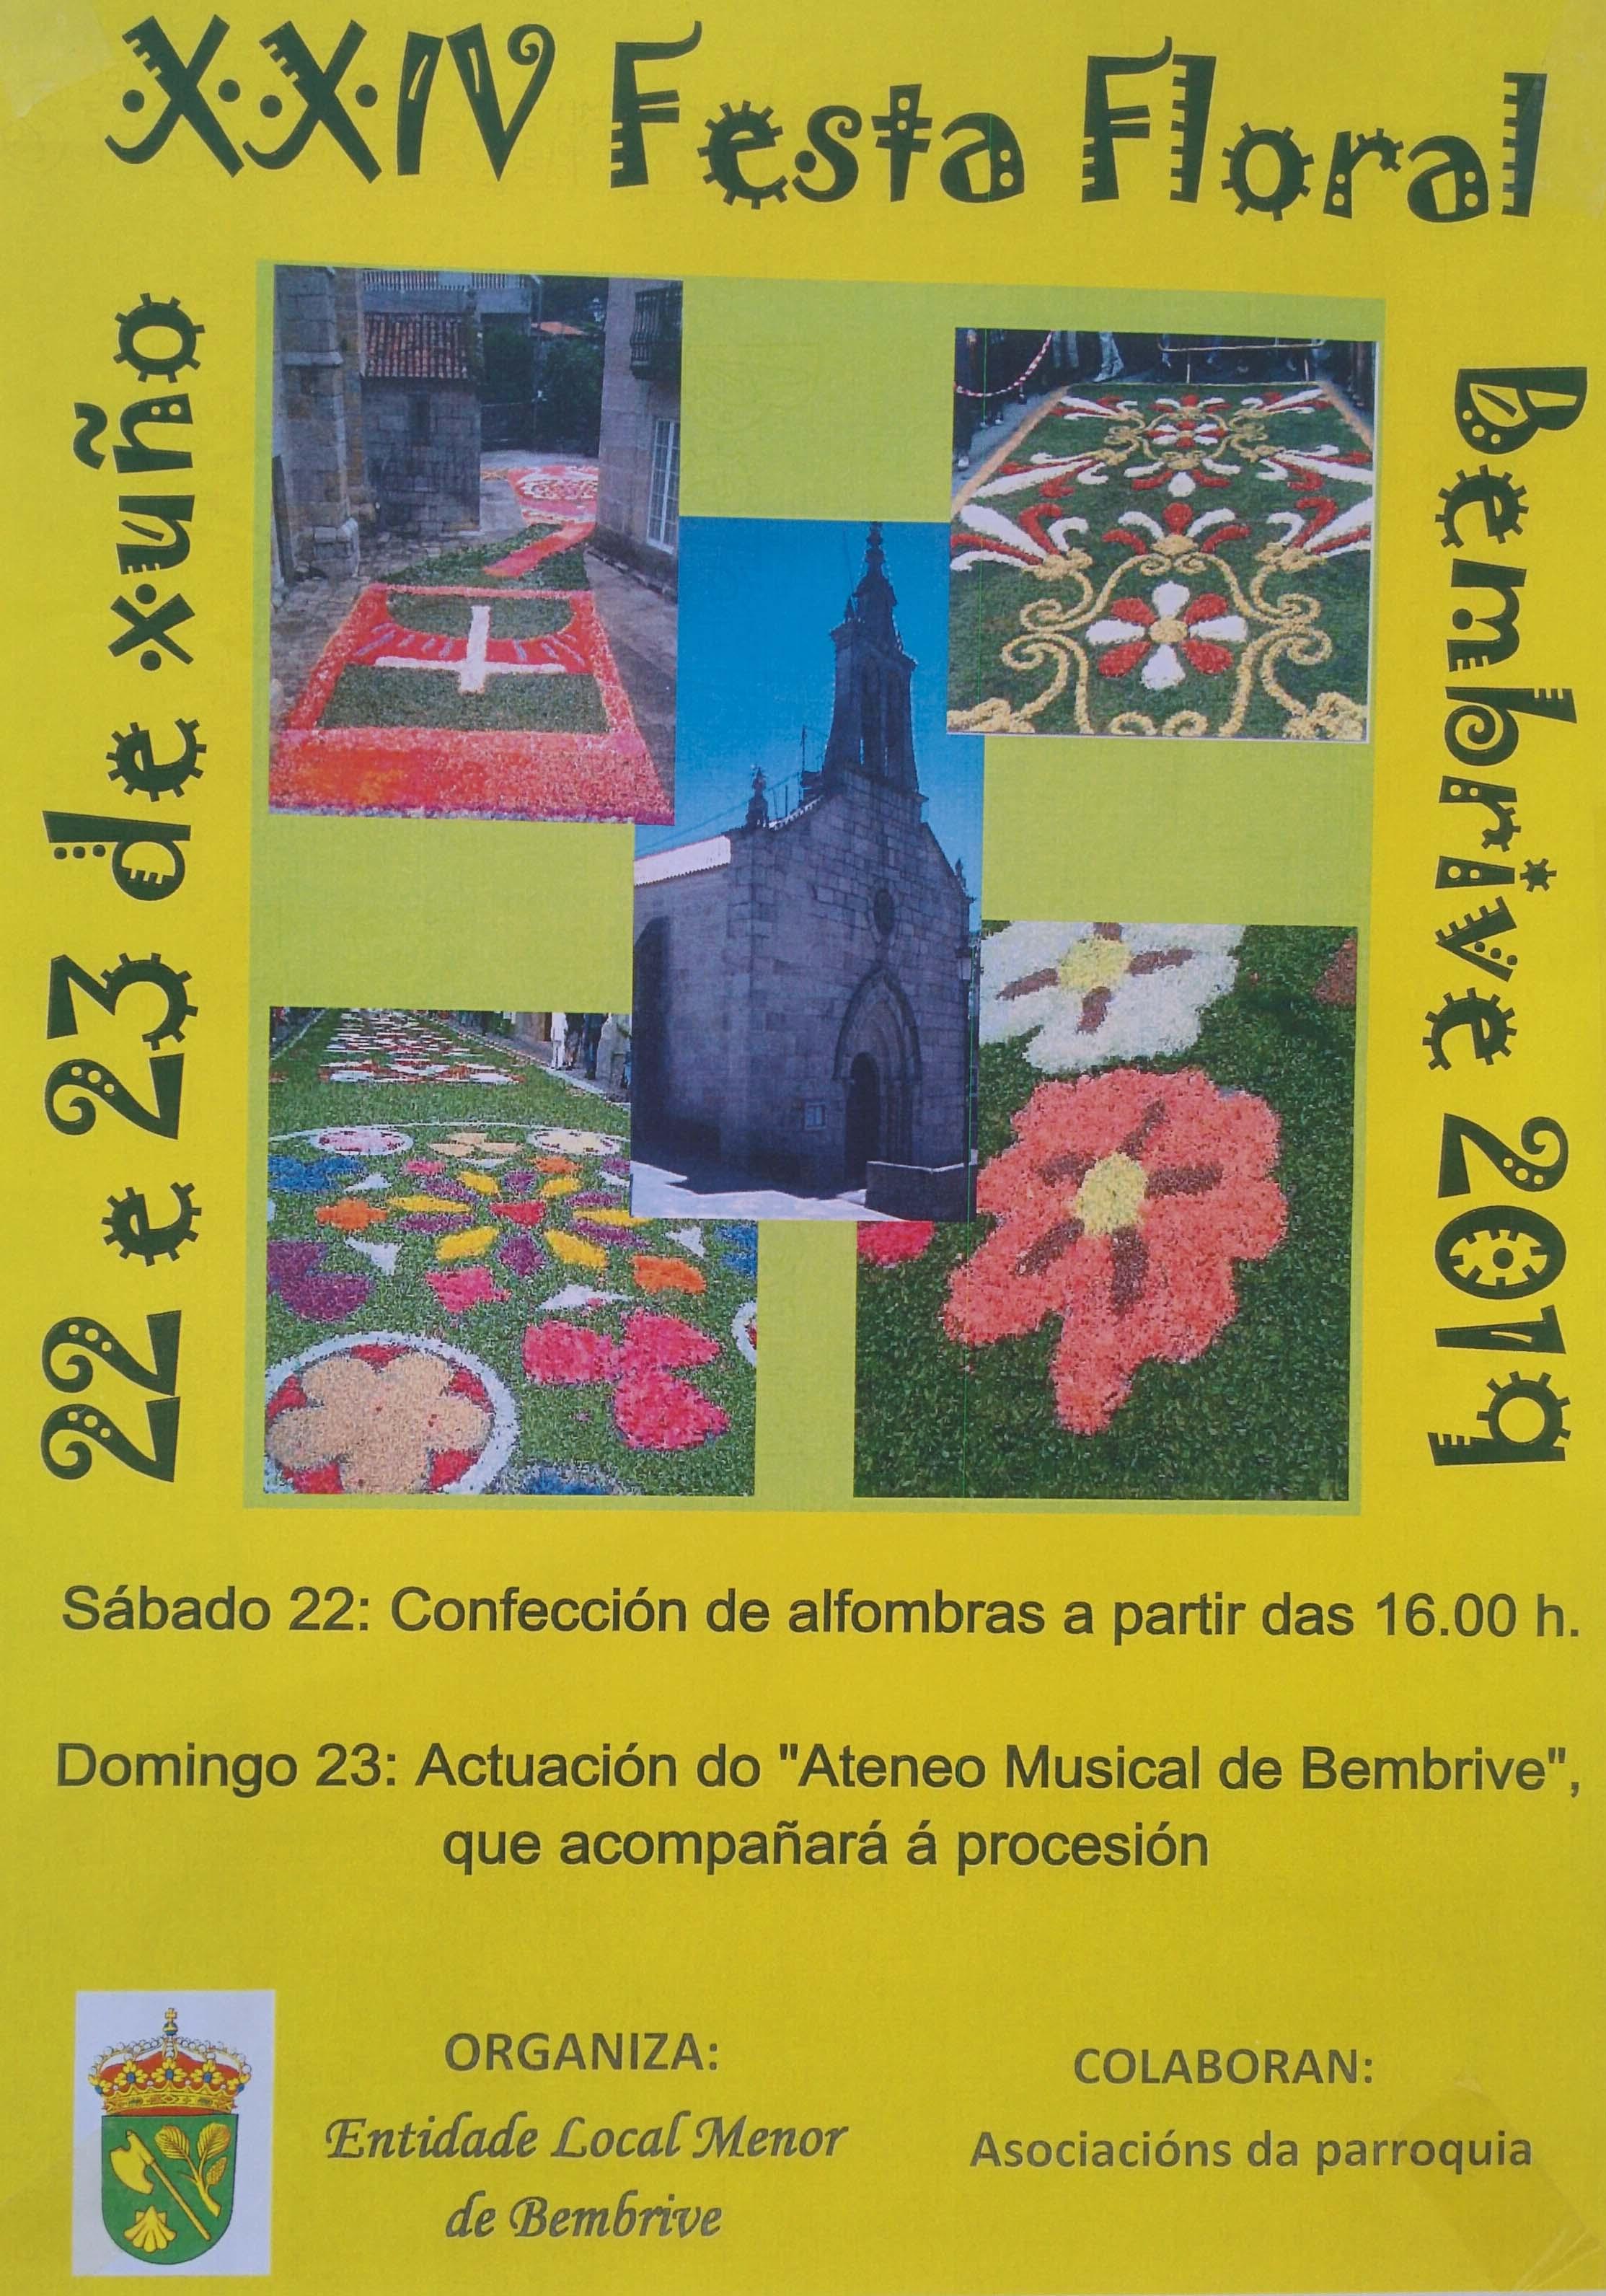 XXIV Festa Floral